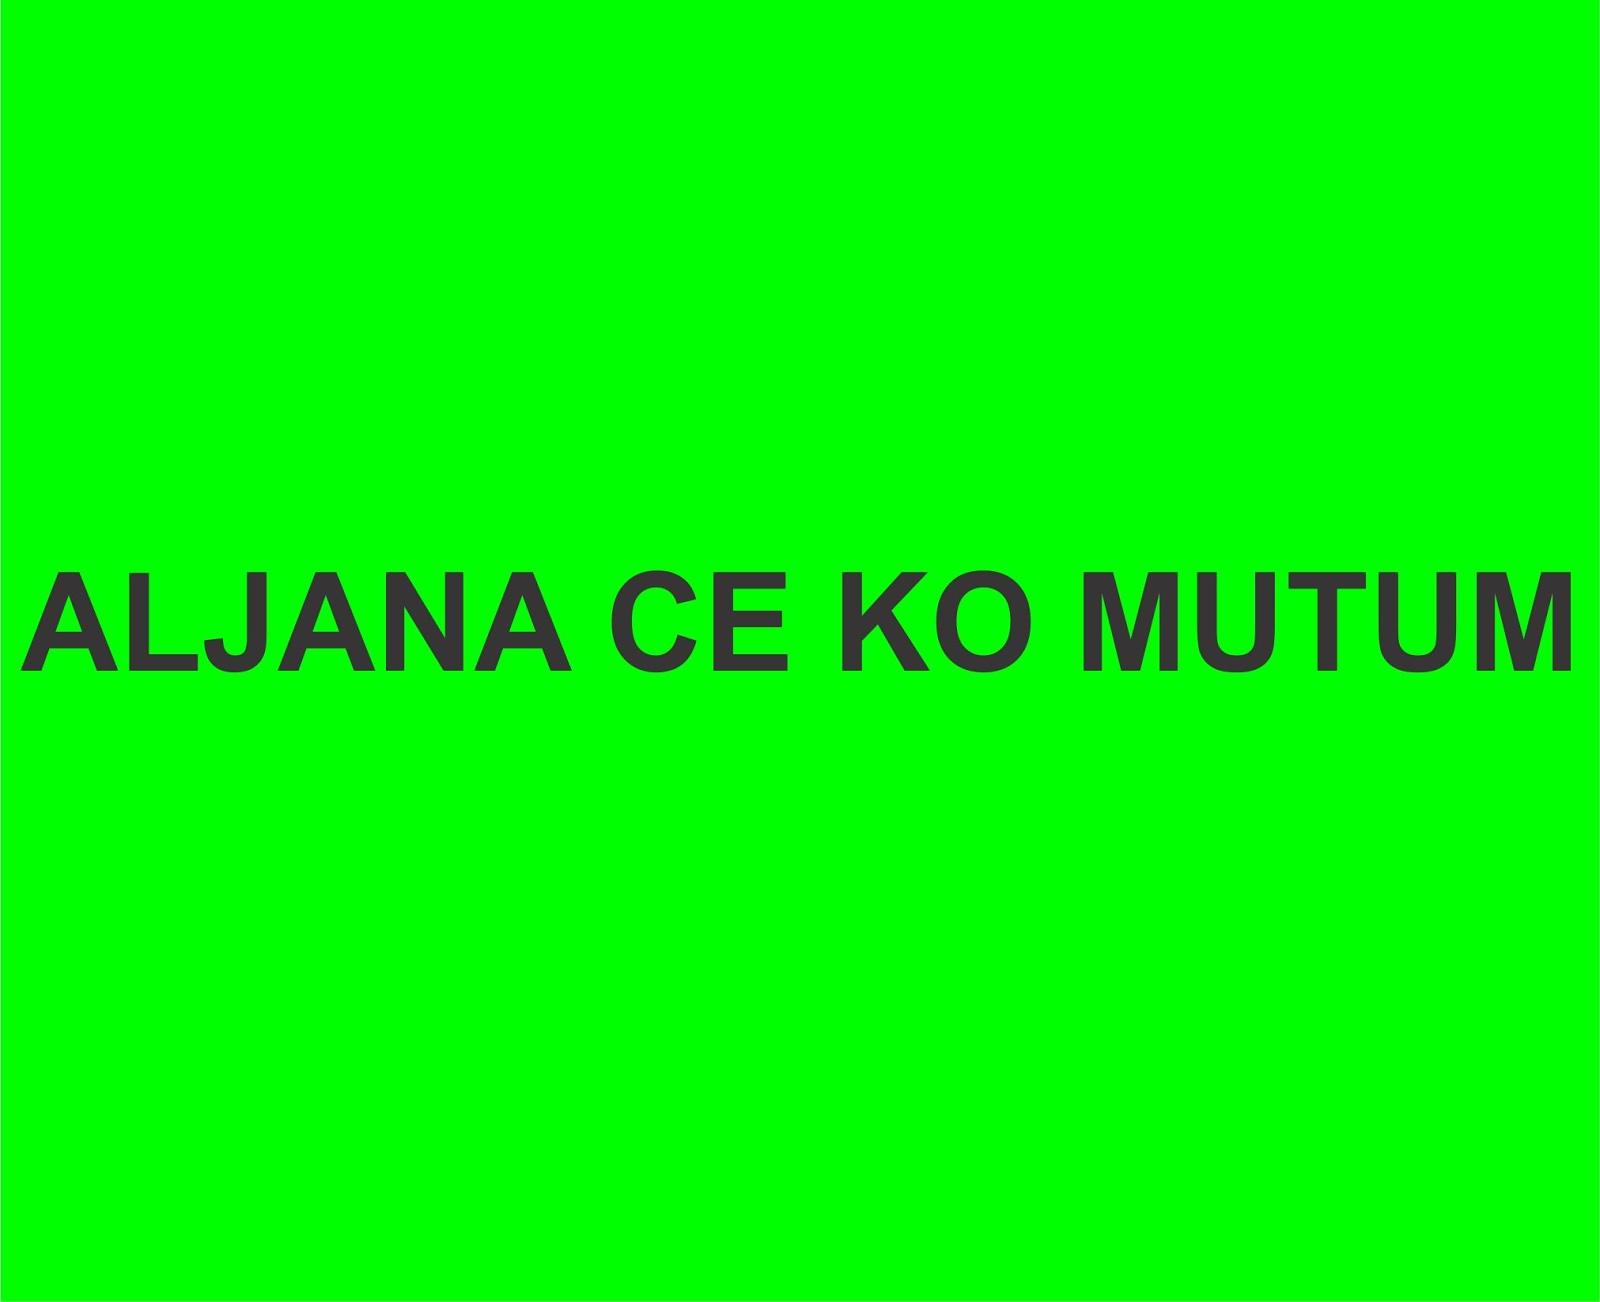 ALJANA CE KO MUTUM COMPLETE - Gidan Novels   Hausa Novels